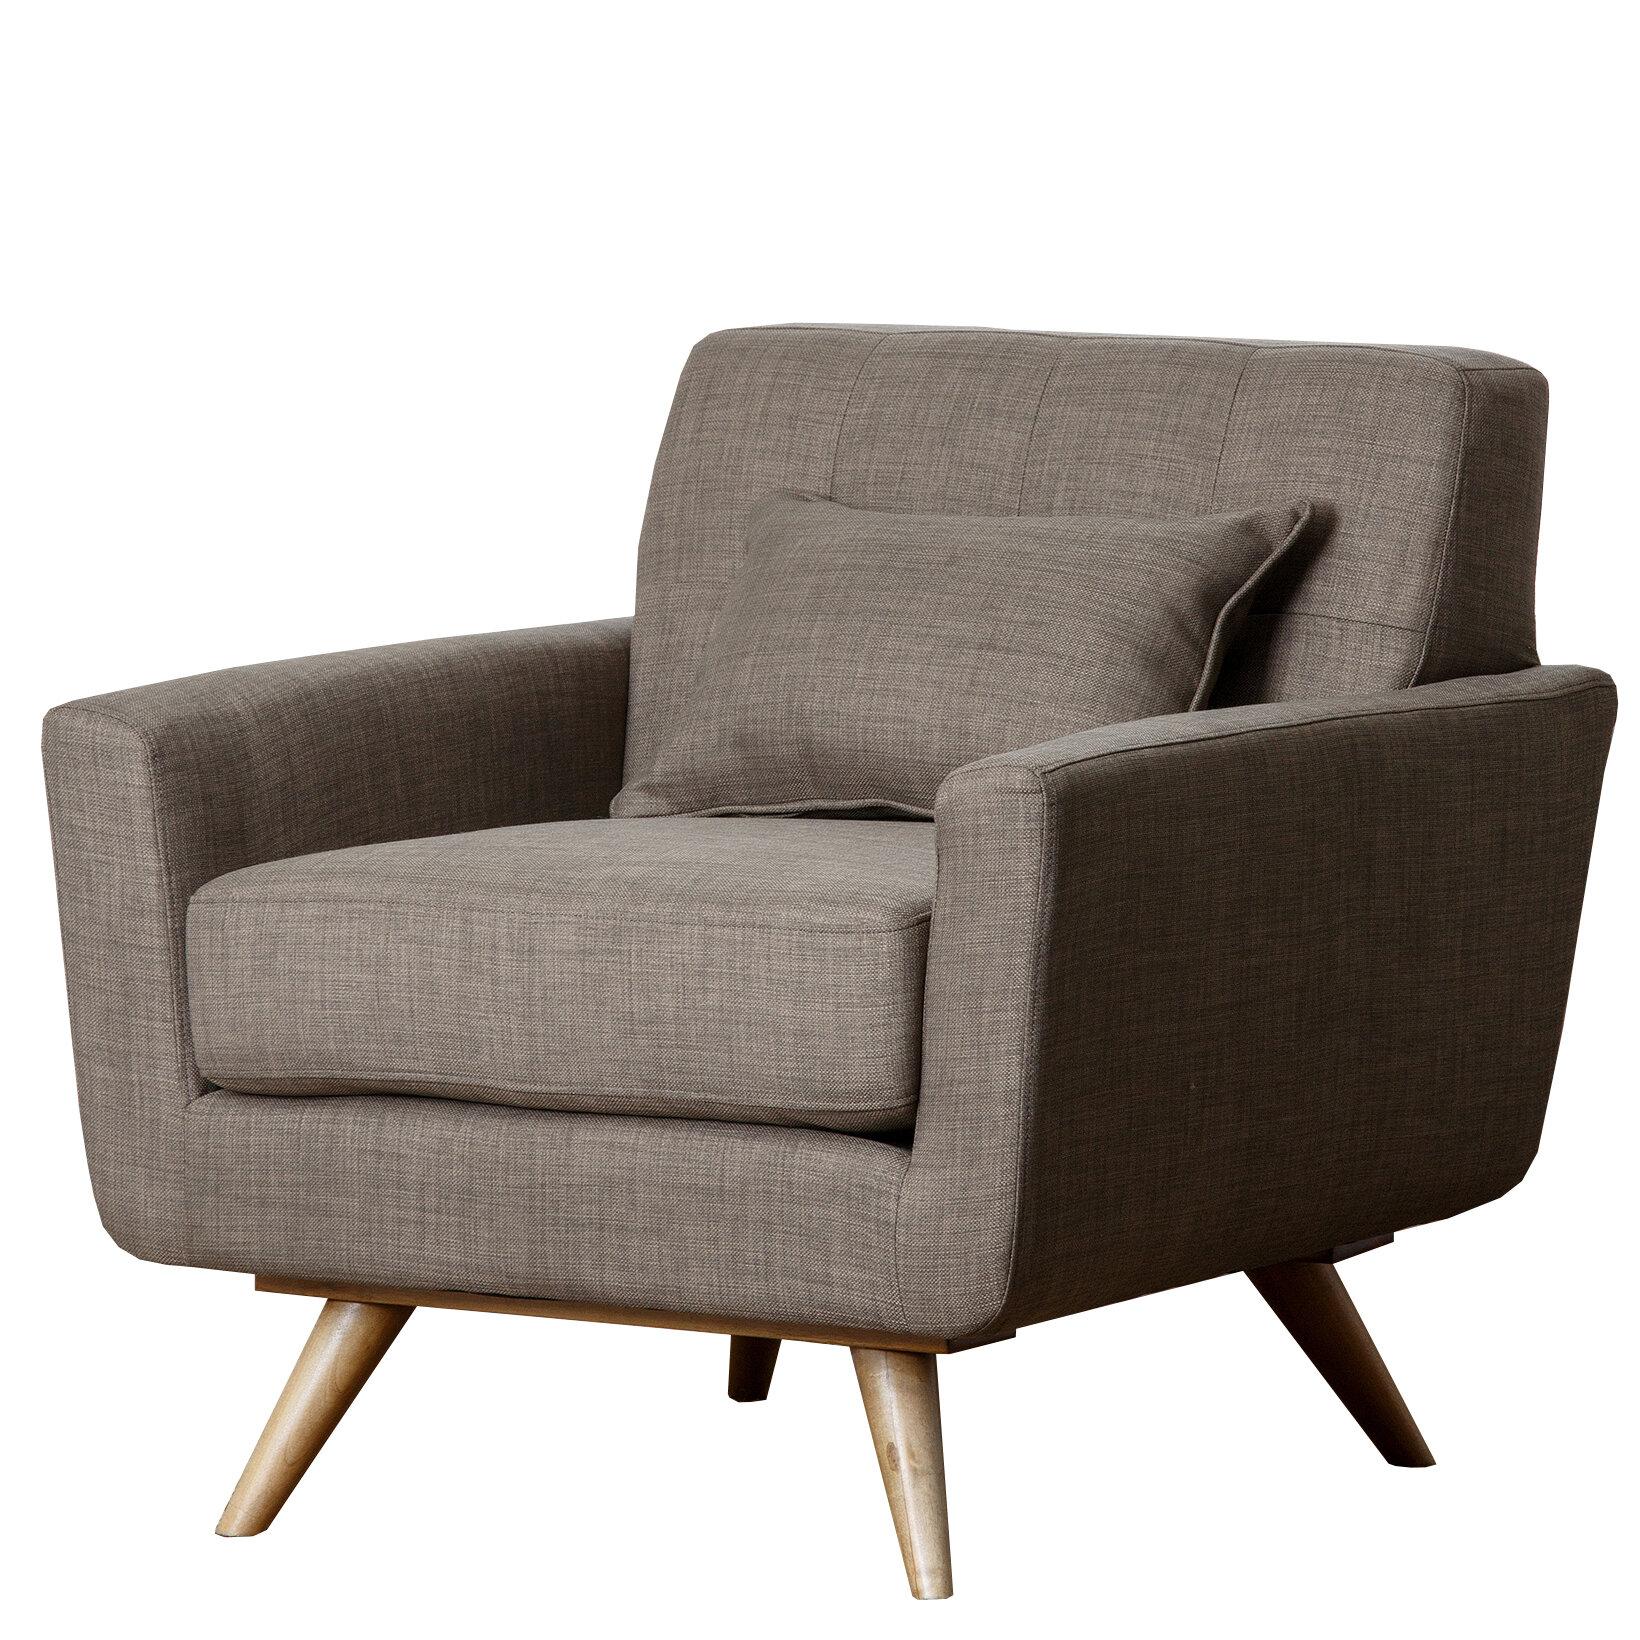 Norton st philip armchair reviews allmodern